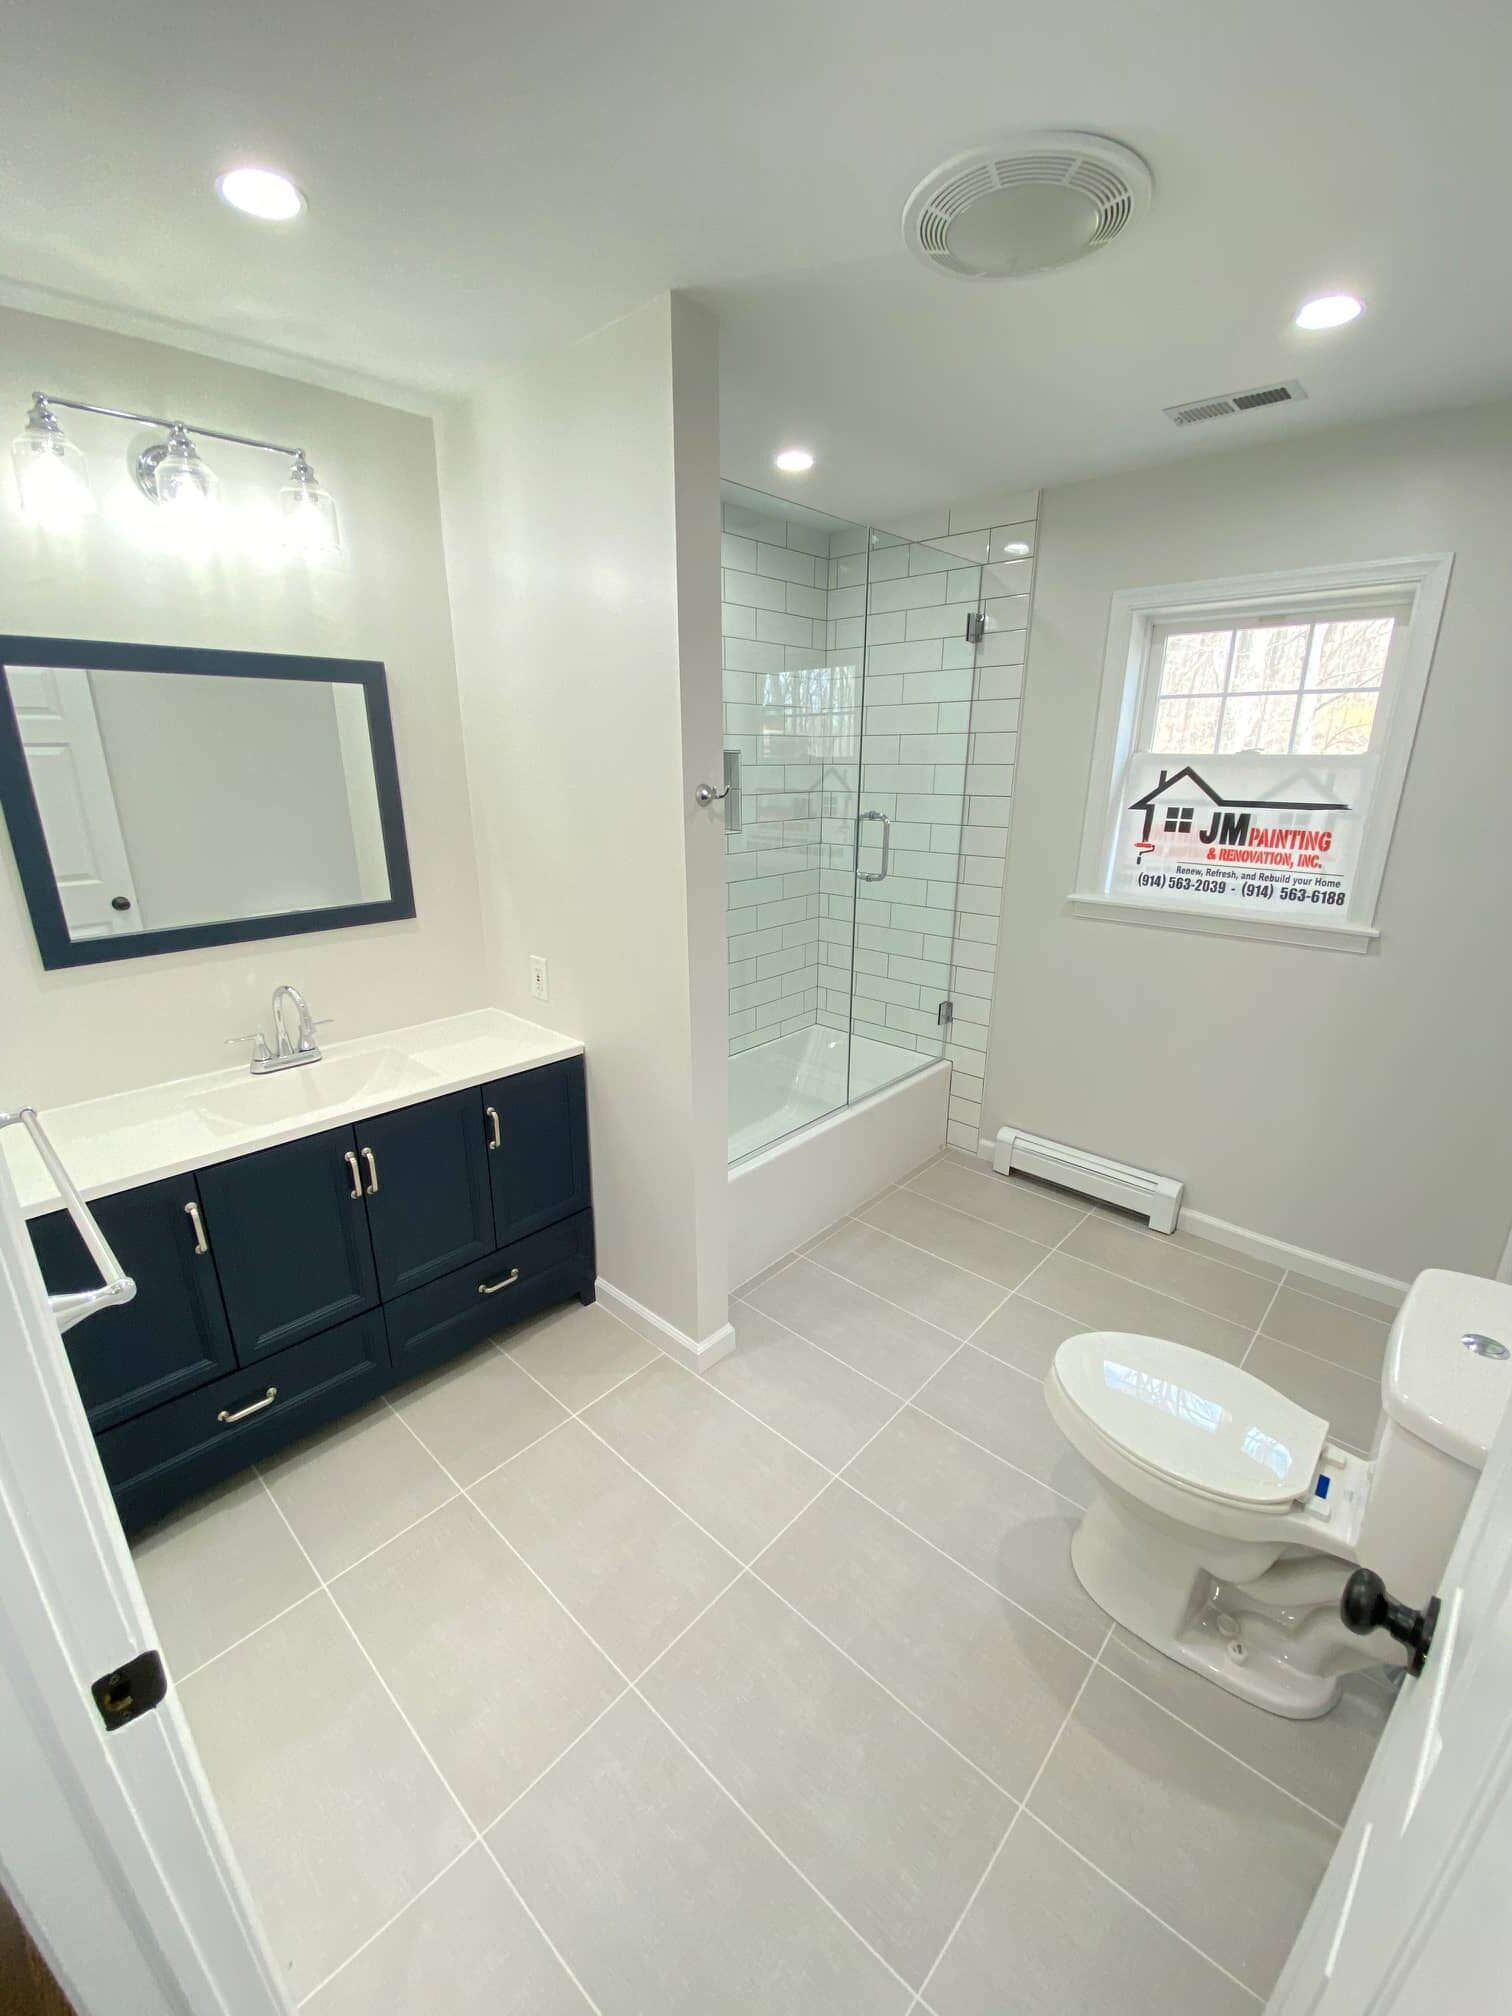 Bathrooms renovation